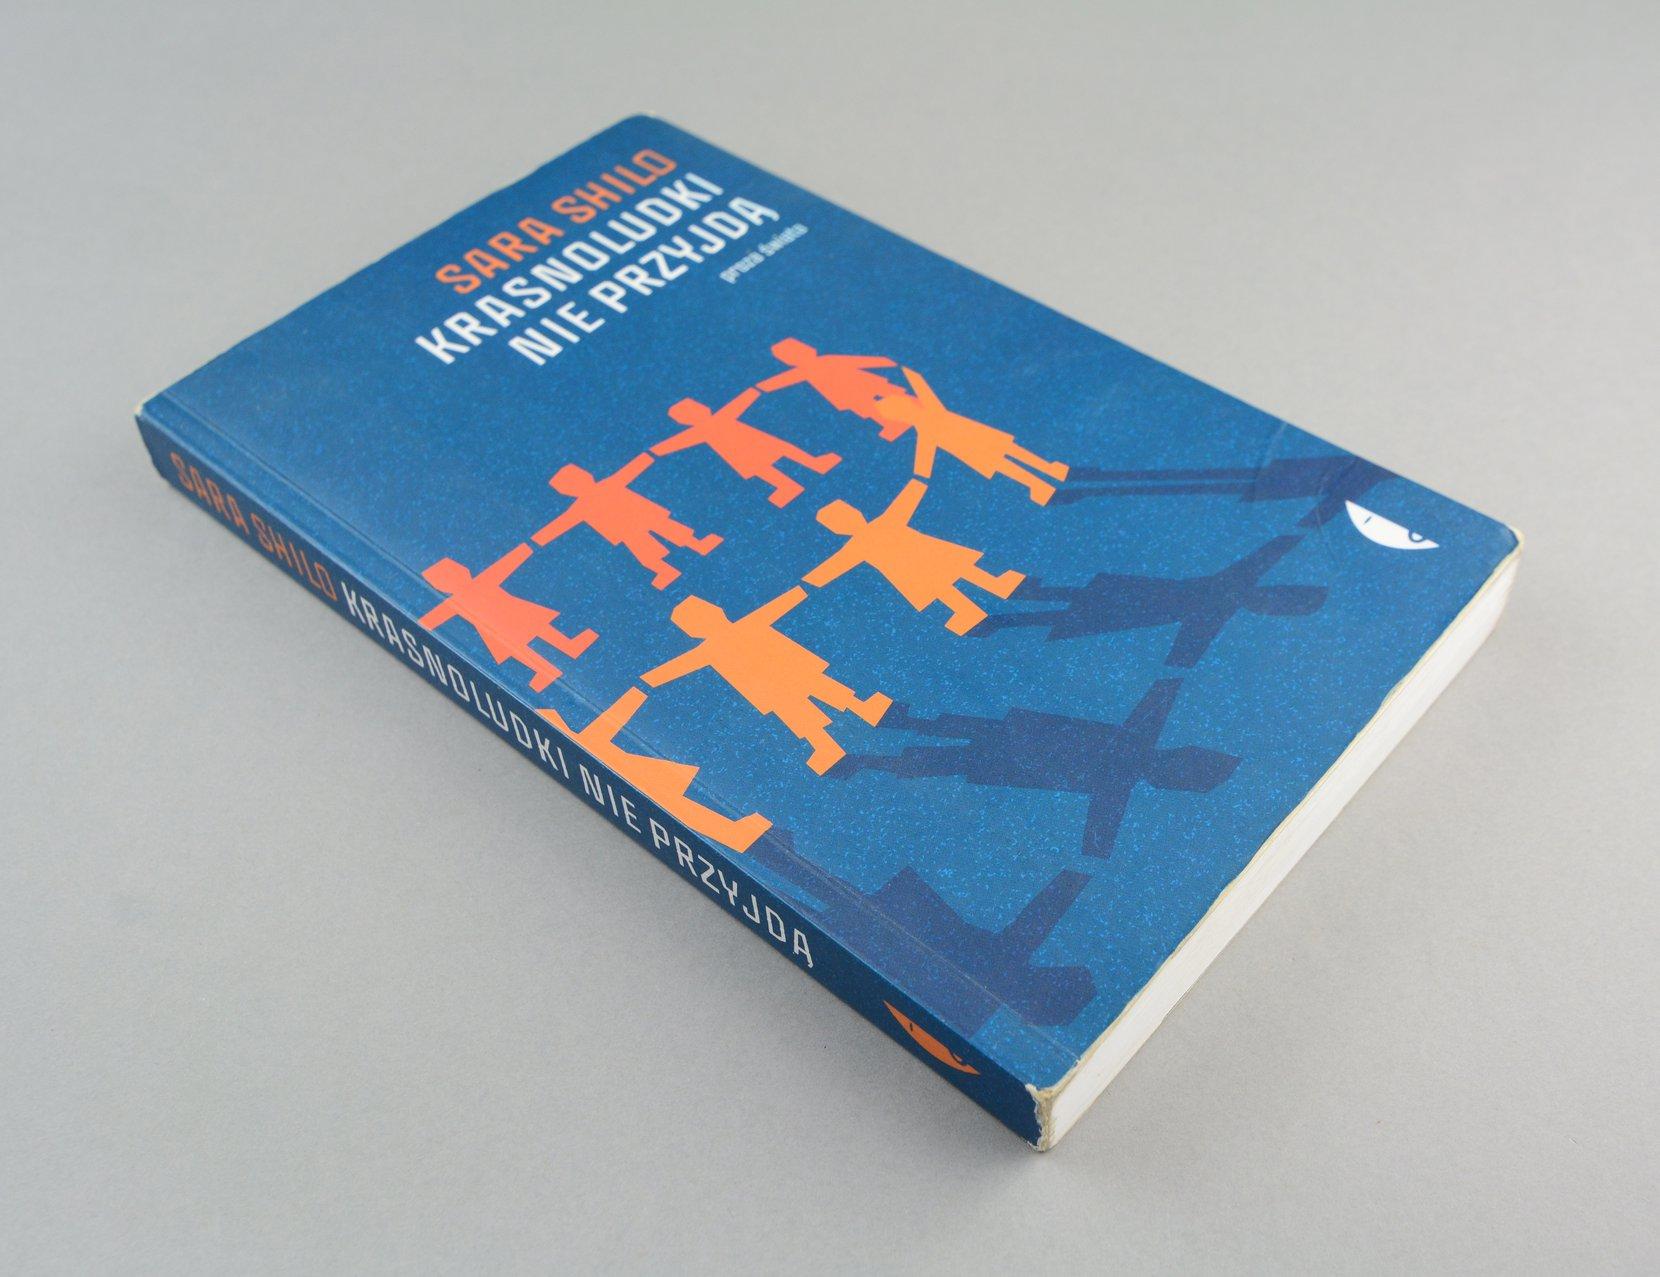 krasnoluski nie przyjdą:  sara shilo (2013) books belles-lettres Sara Shilo